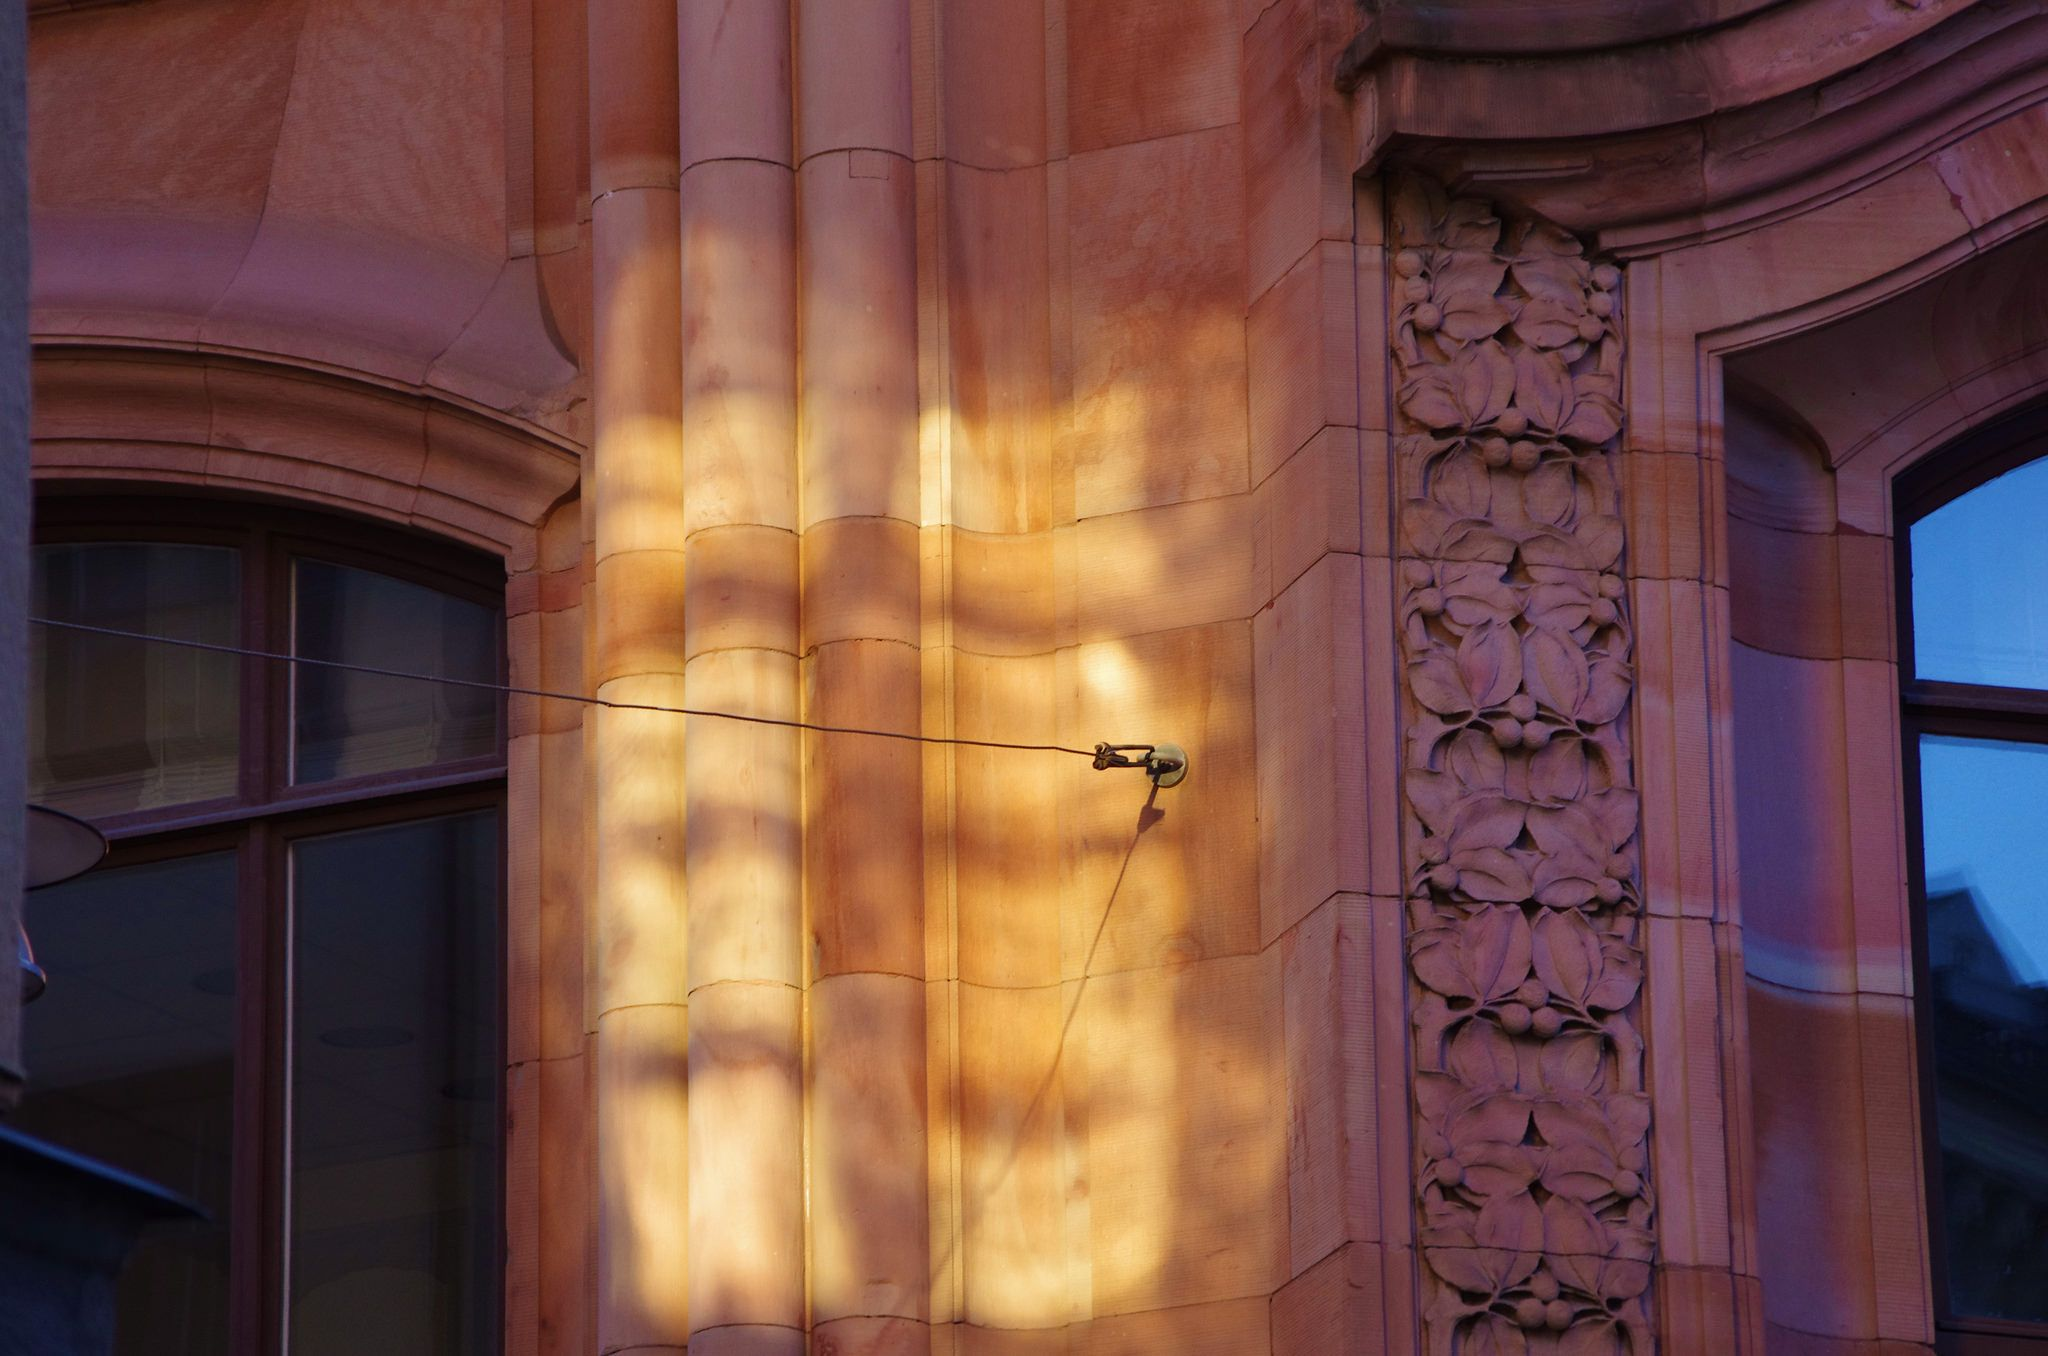 https://flic.kr/p/DqrtVR | Stockholm 74 - à l'angle de Drottninggatan et de Fredsgatan